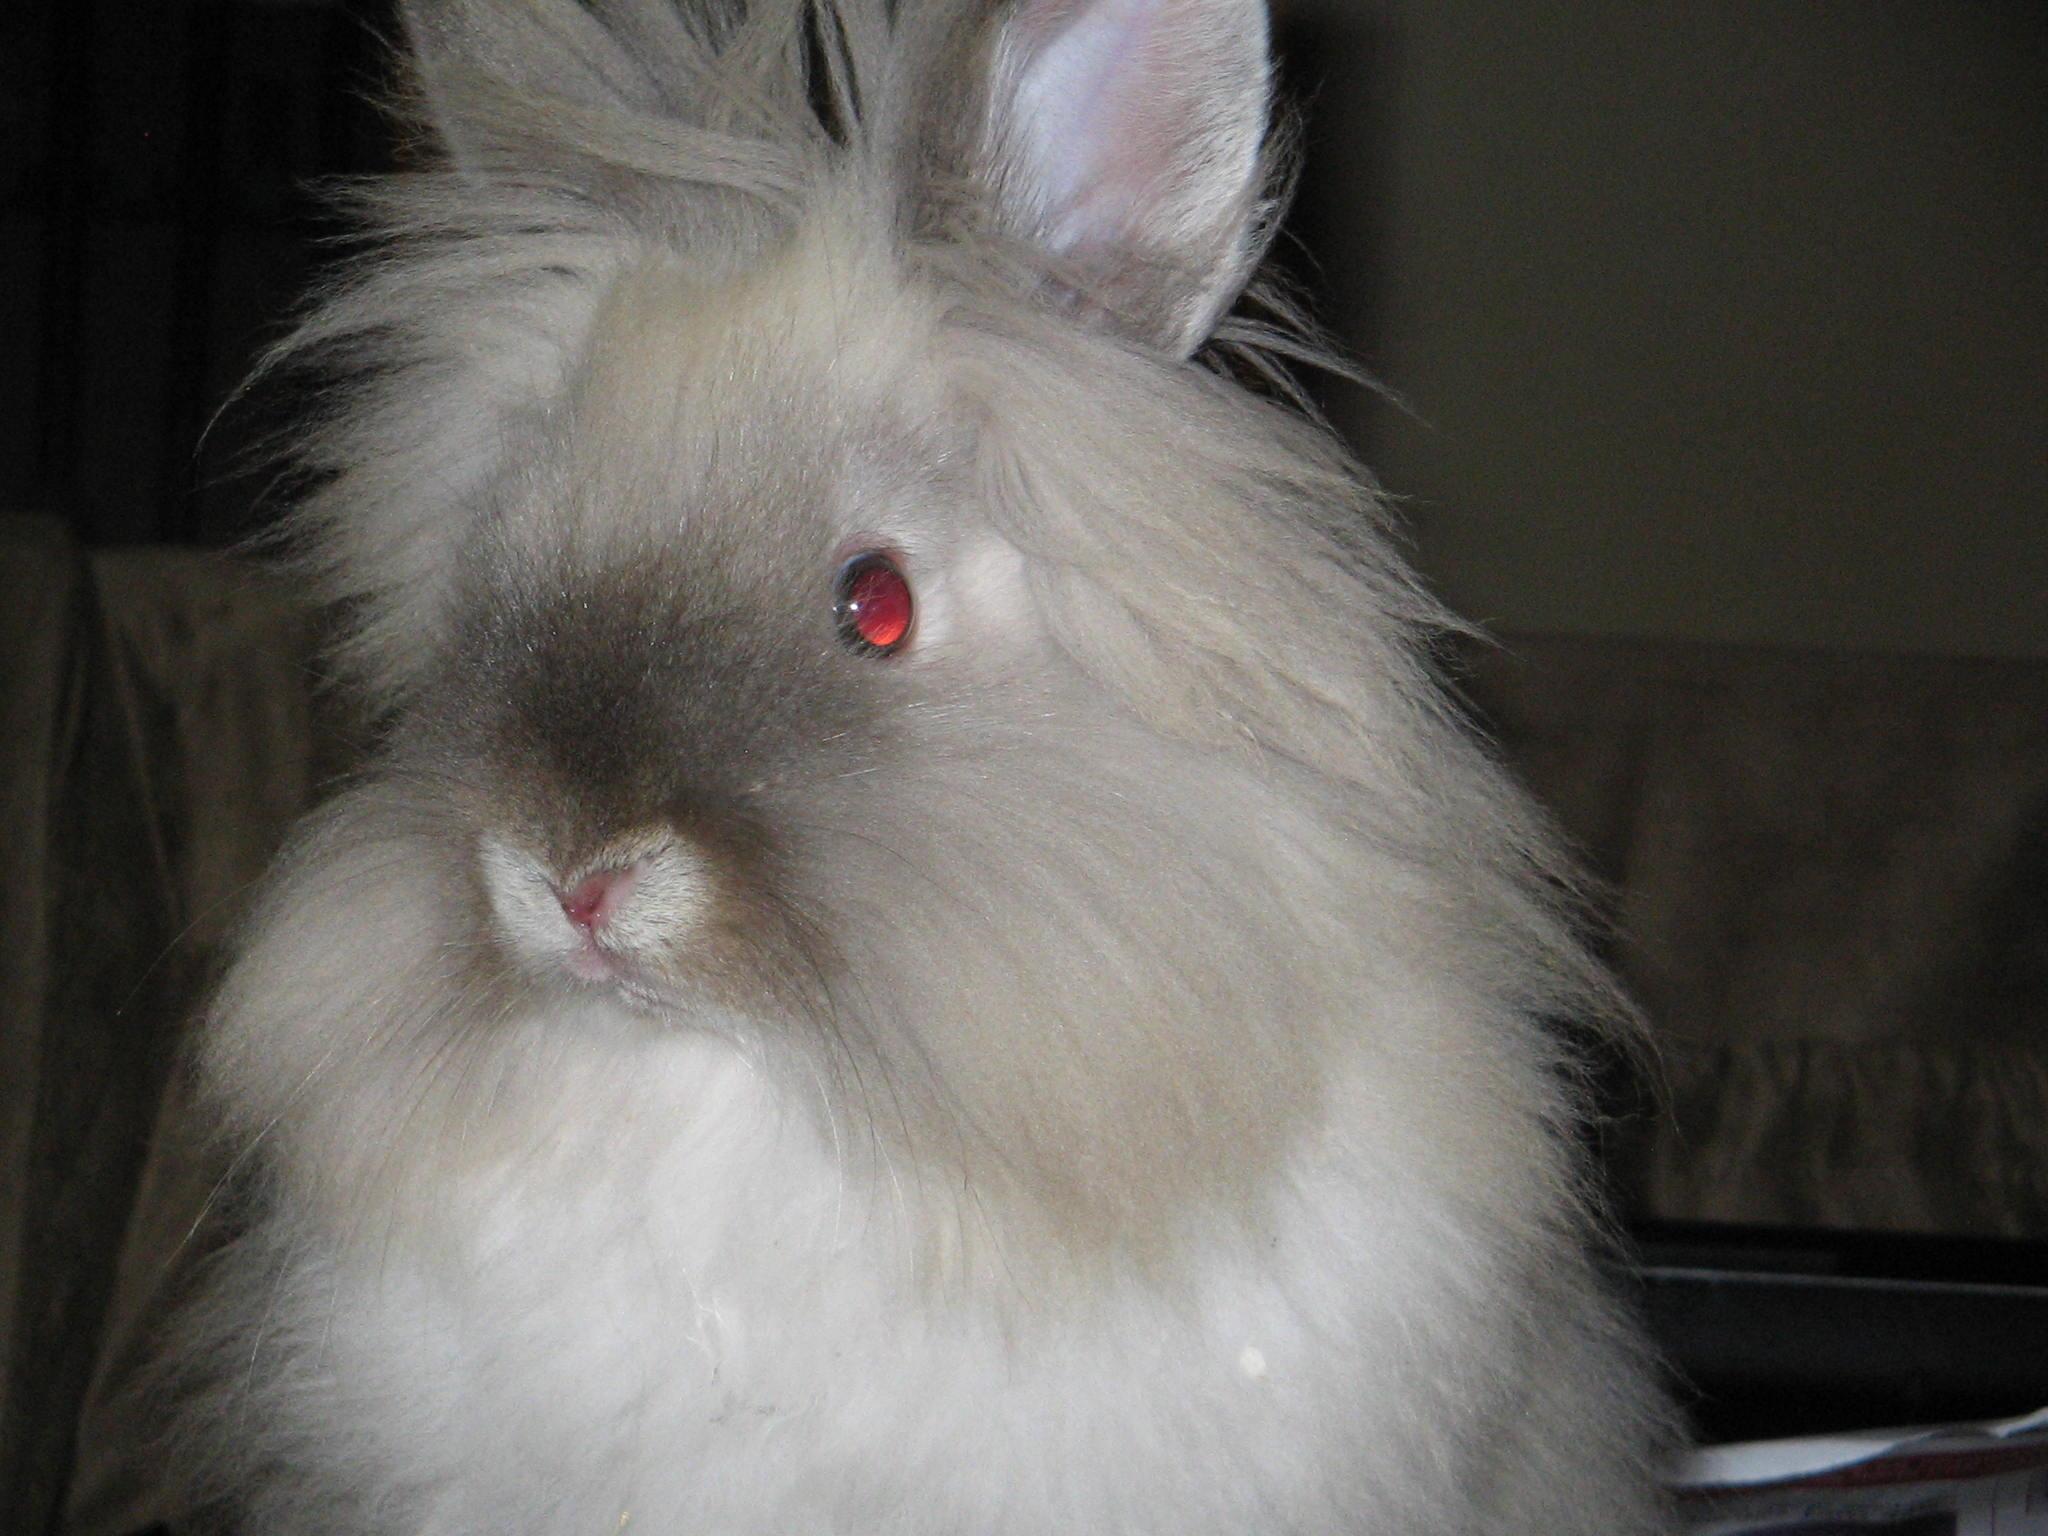 Rabbit dating service